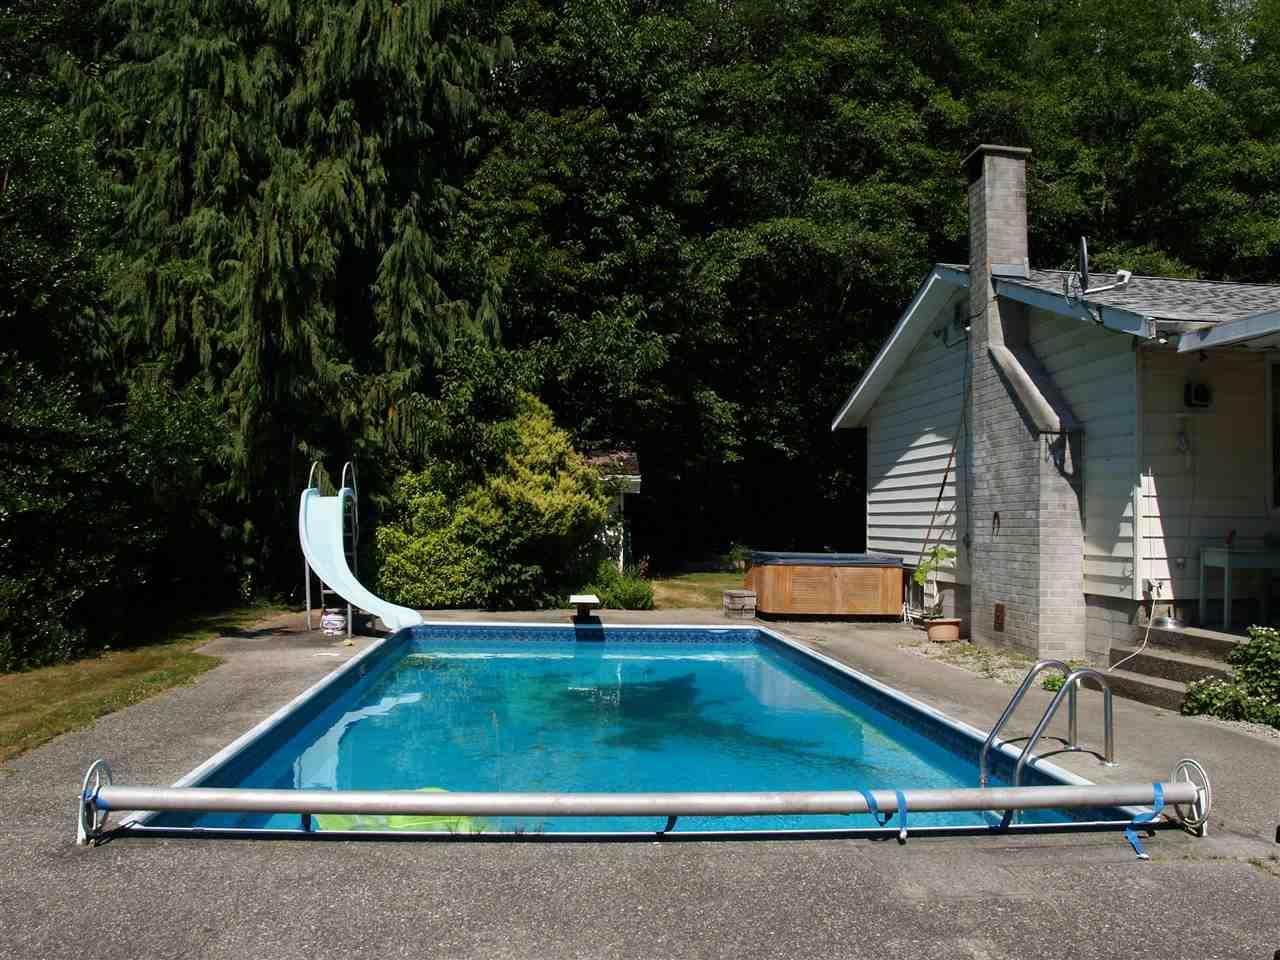 Detached at 1289 LOCKYER ROAD, Sunshine Coast, British Columbia. Image 1